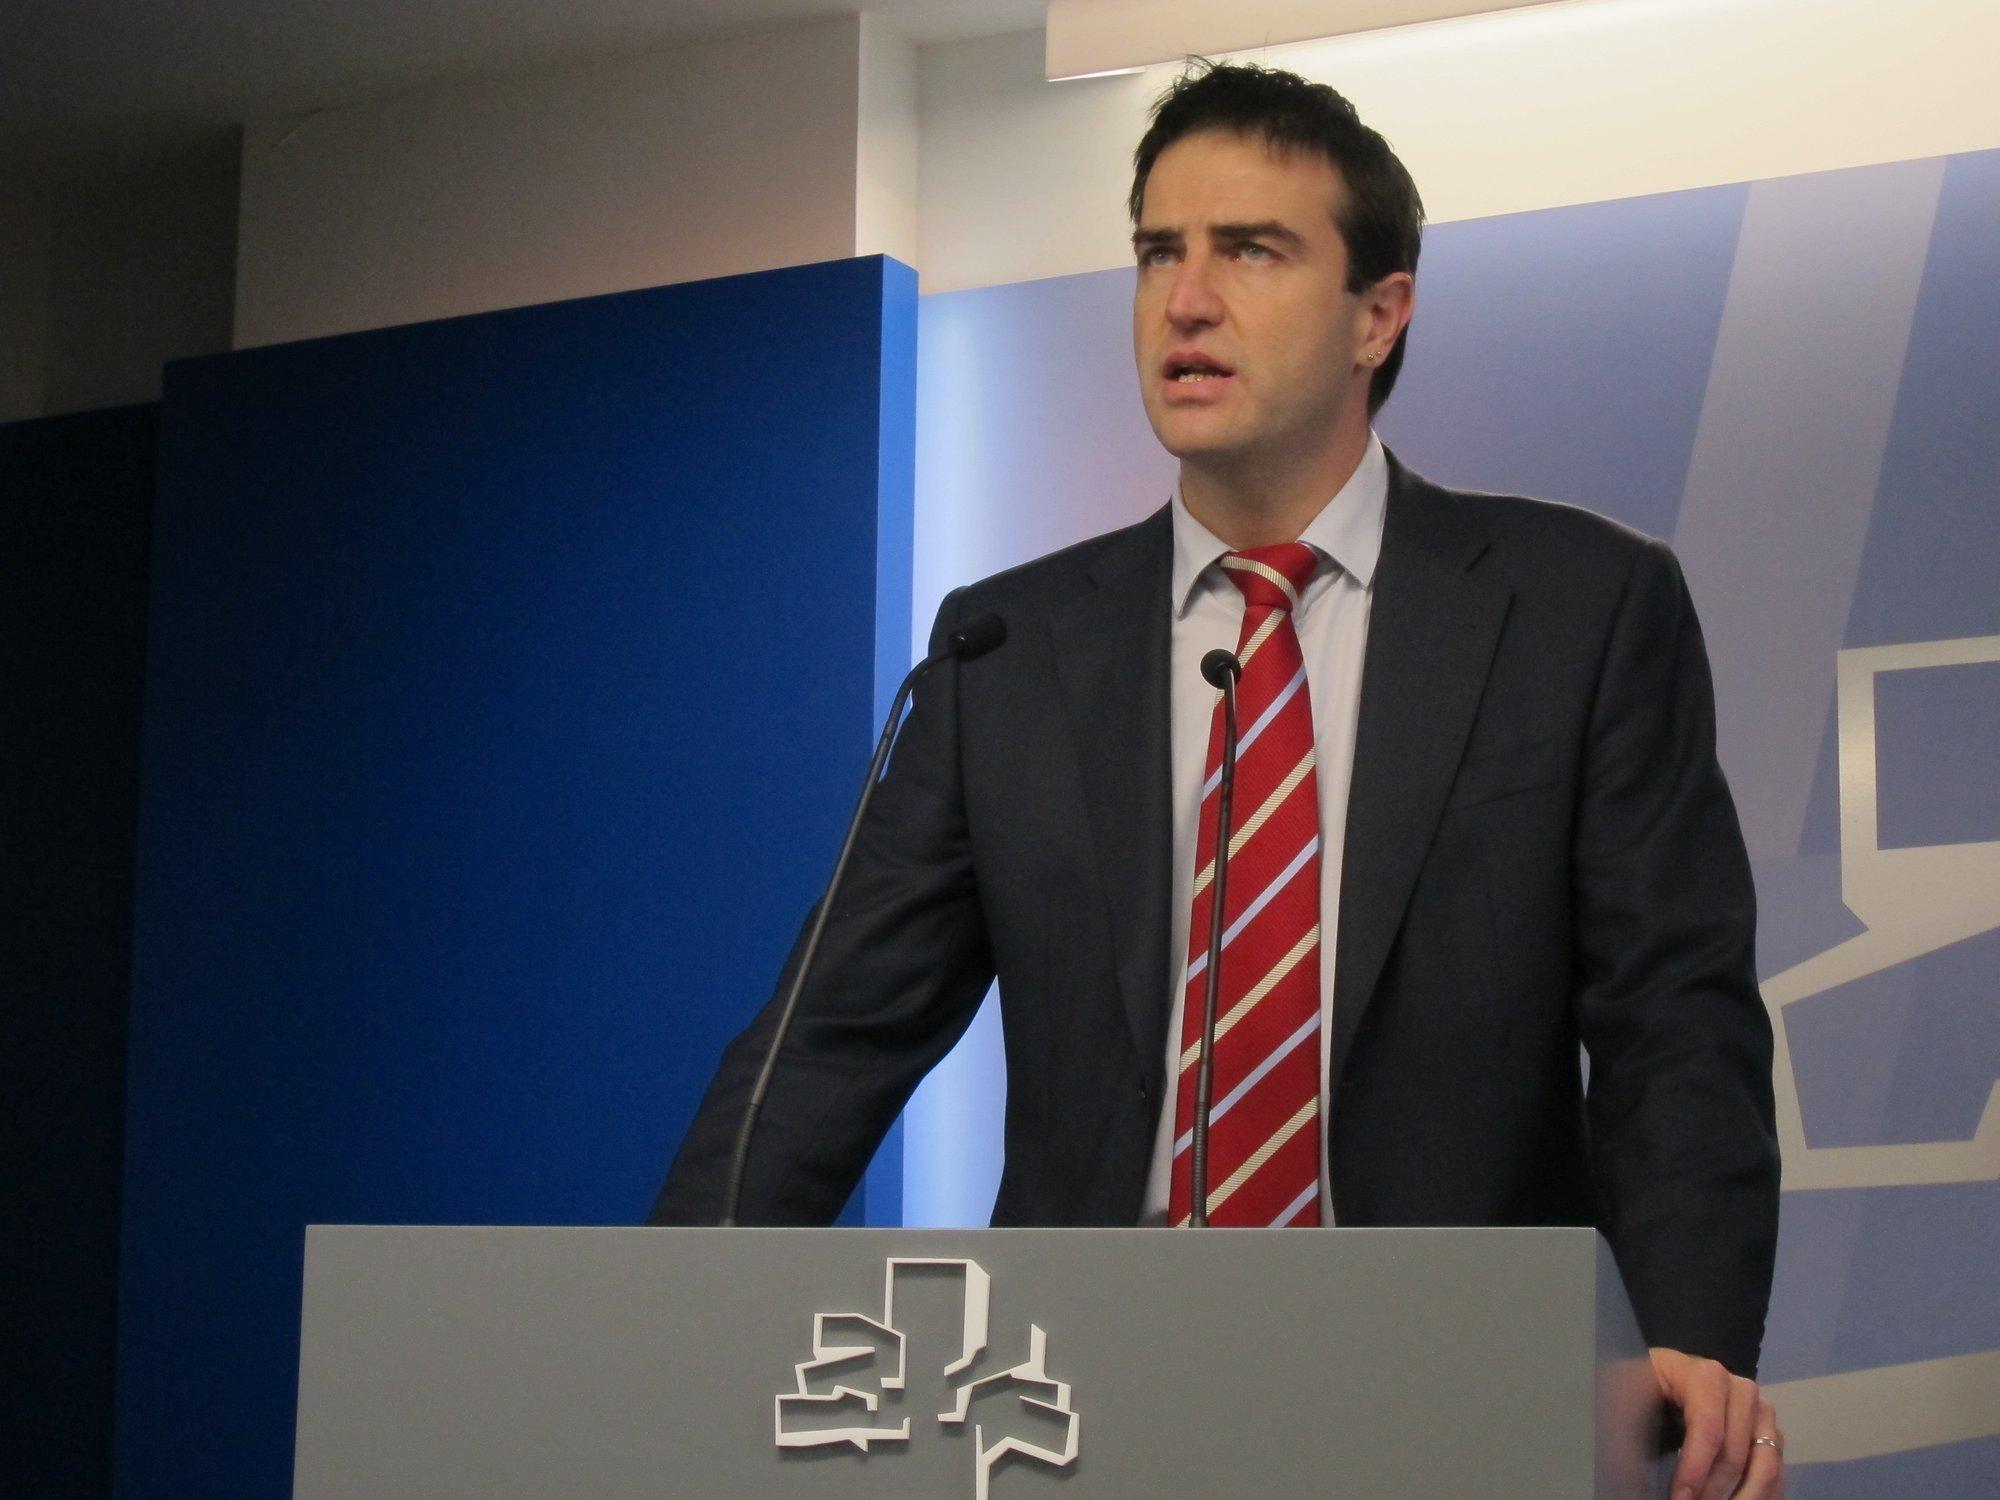 Maneiro (UPyD) dice que si EH Bildu no exige a ETA que se disuelva «volverá a demostrar que está a su servicio»